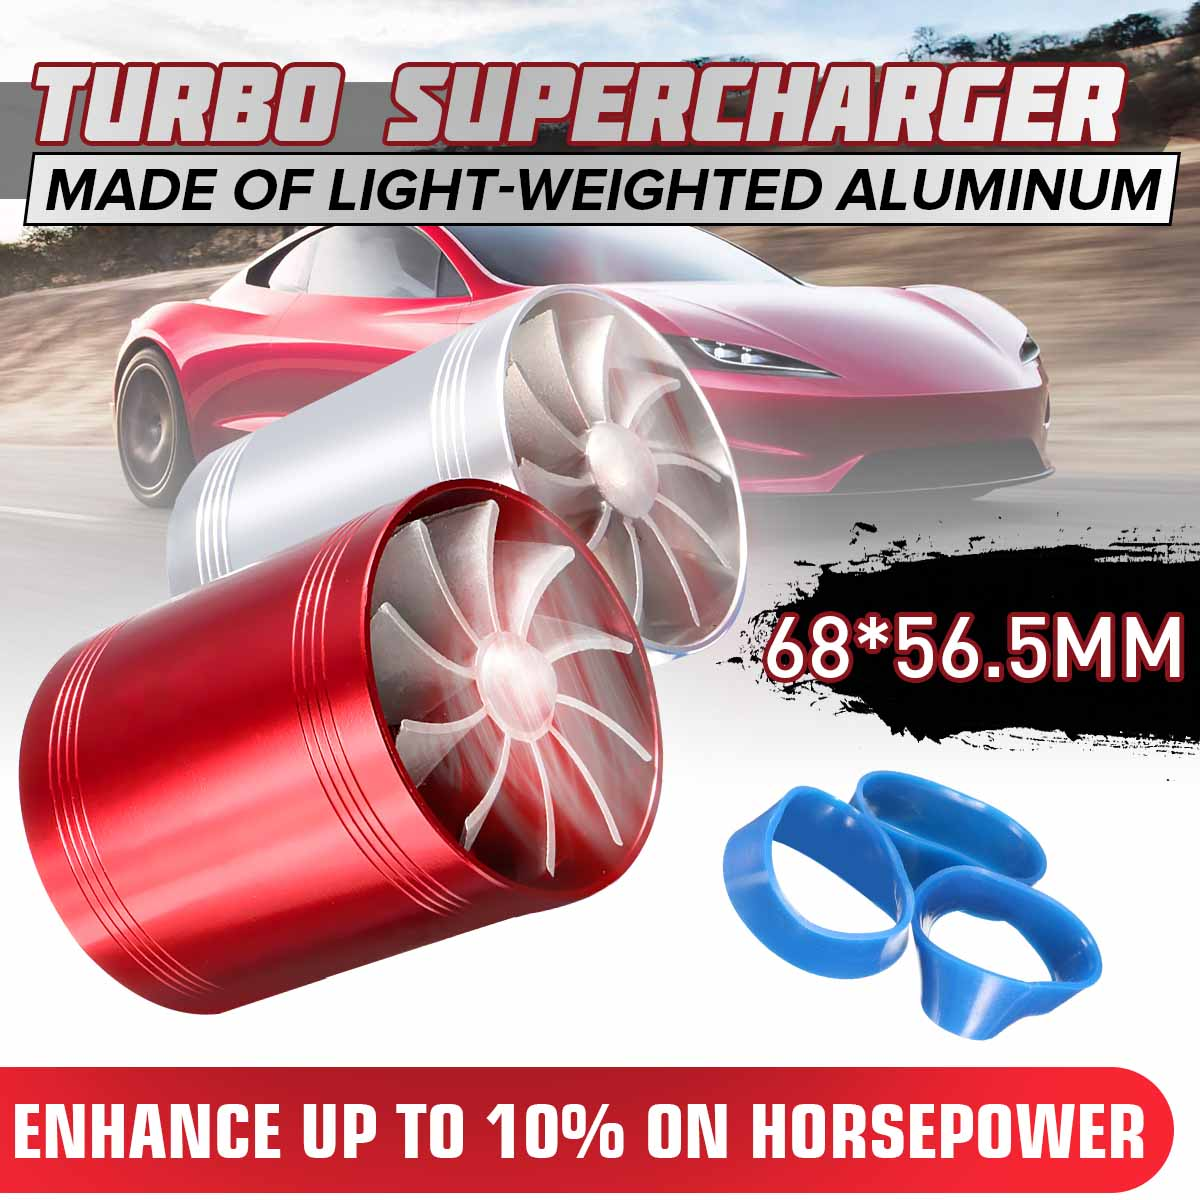 68mm x 56.5mm 범용 자동차 공기 필터 흡기 팬 연료 가스 보호기 과급기 MV77942B 터빈 터보 충전기 터보 차저 용